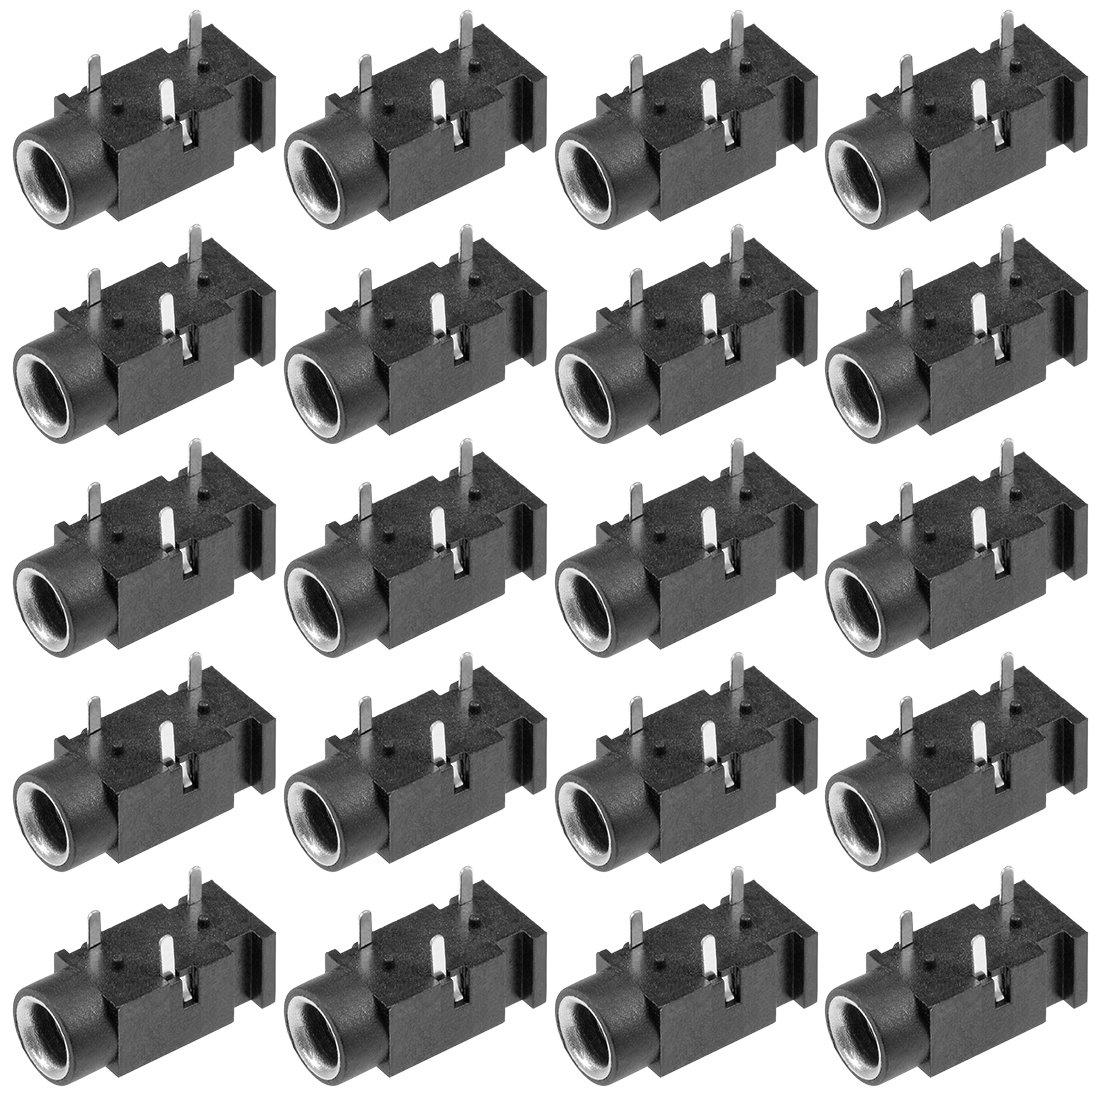 uxcell 20Pcs PCB Mount 3.5mm 3 Pin Socket Headphone Stereo Jack Audio Video Connector Black PJ320